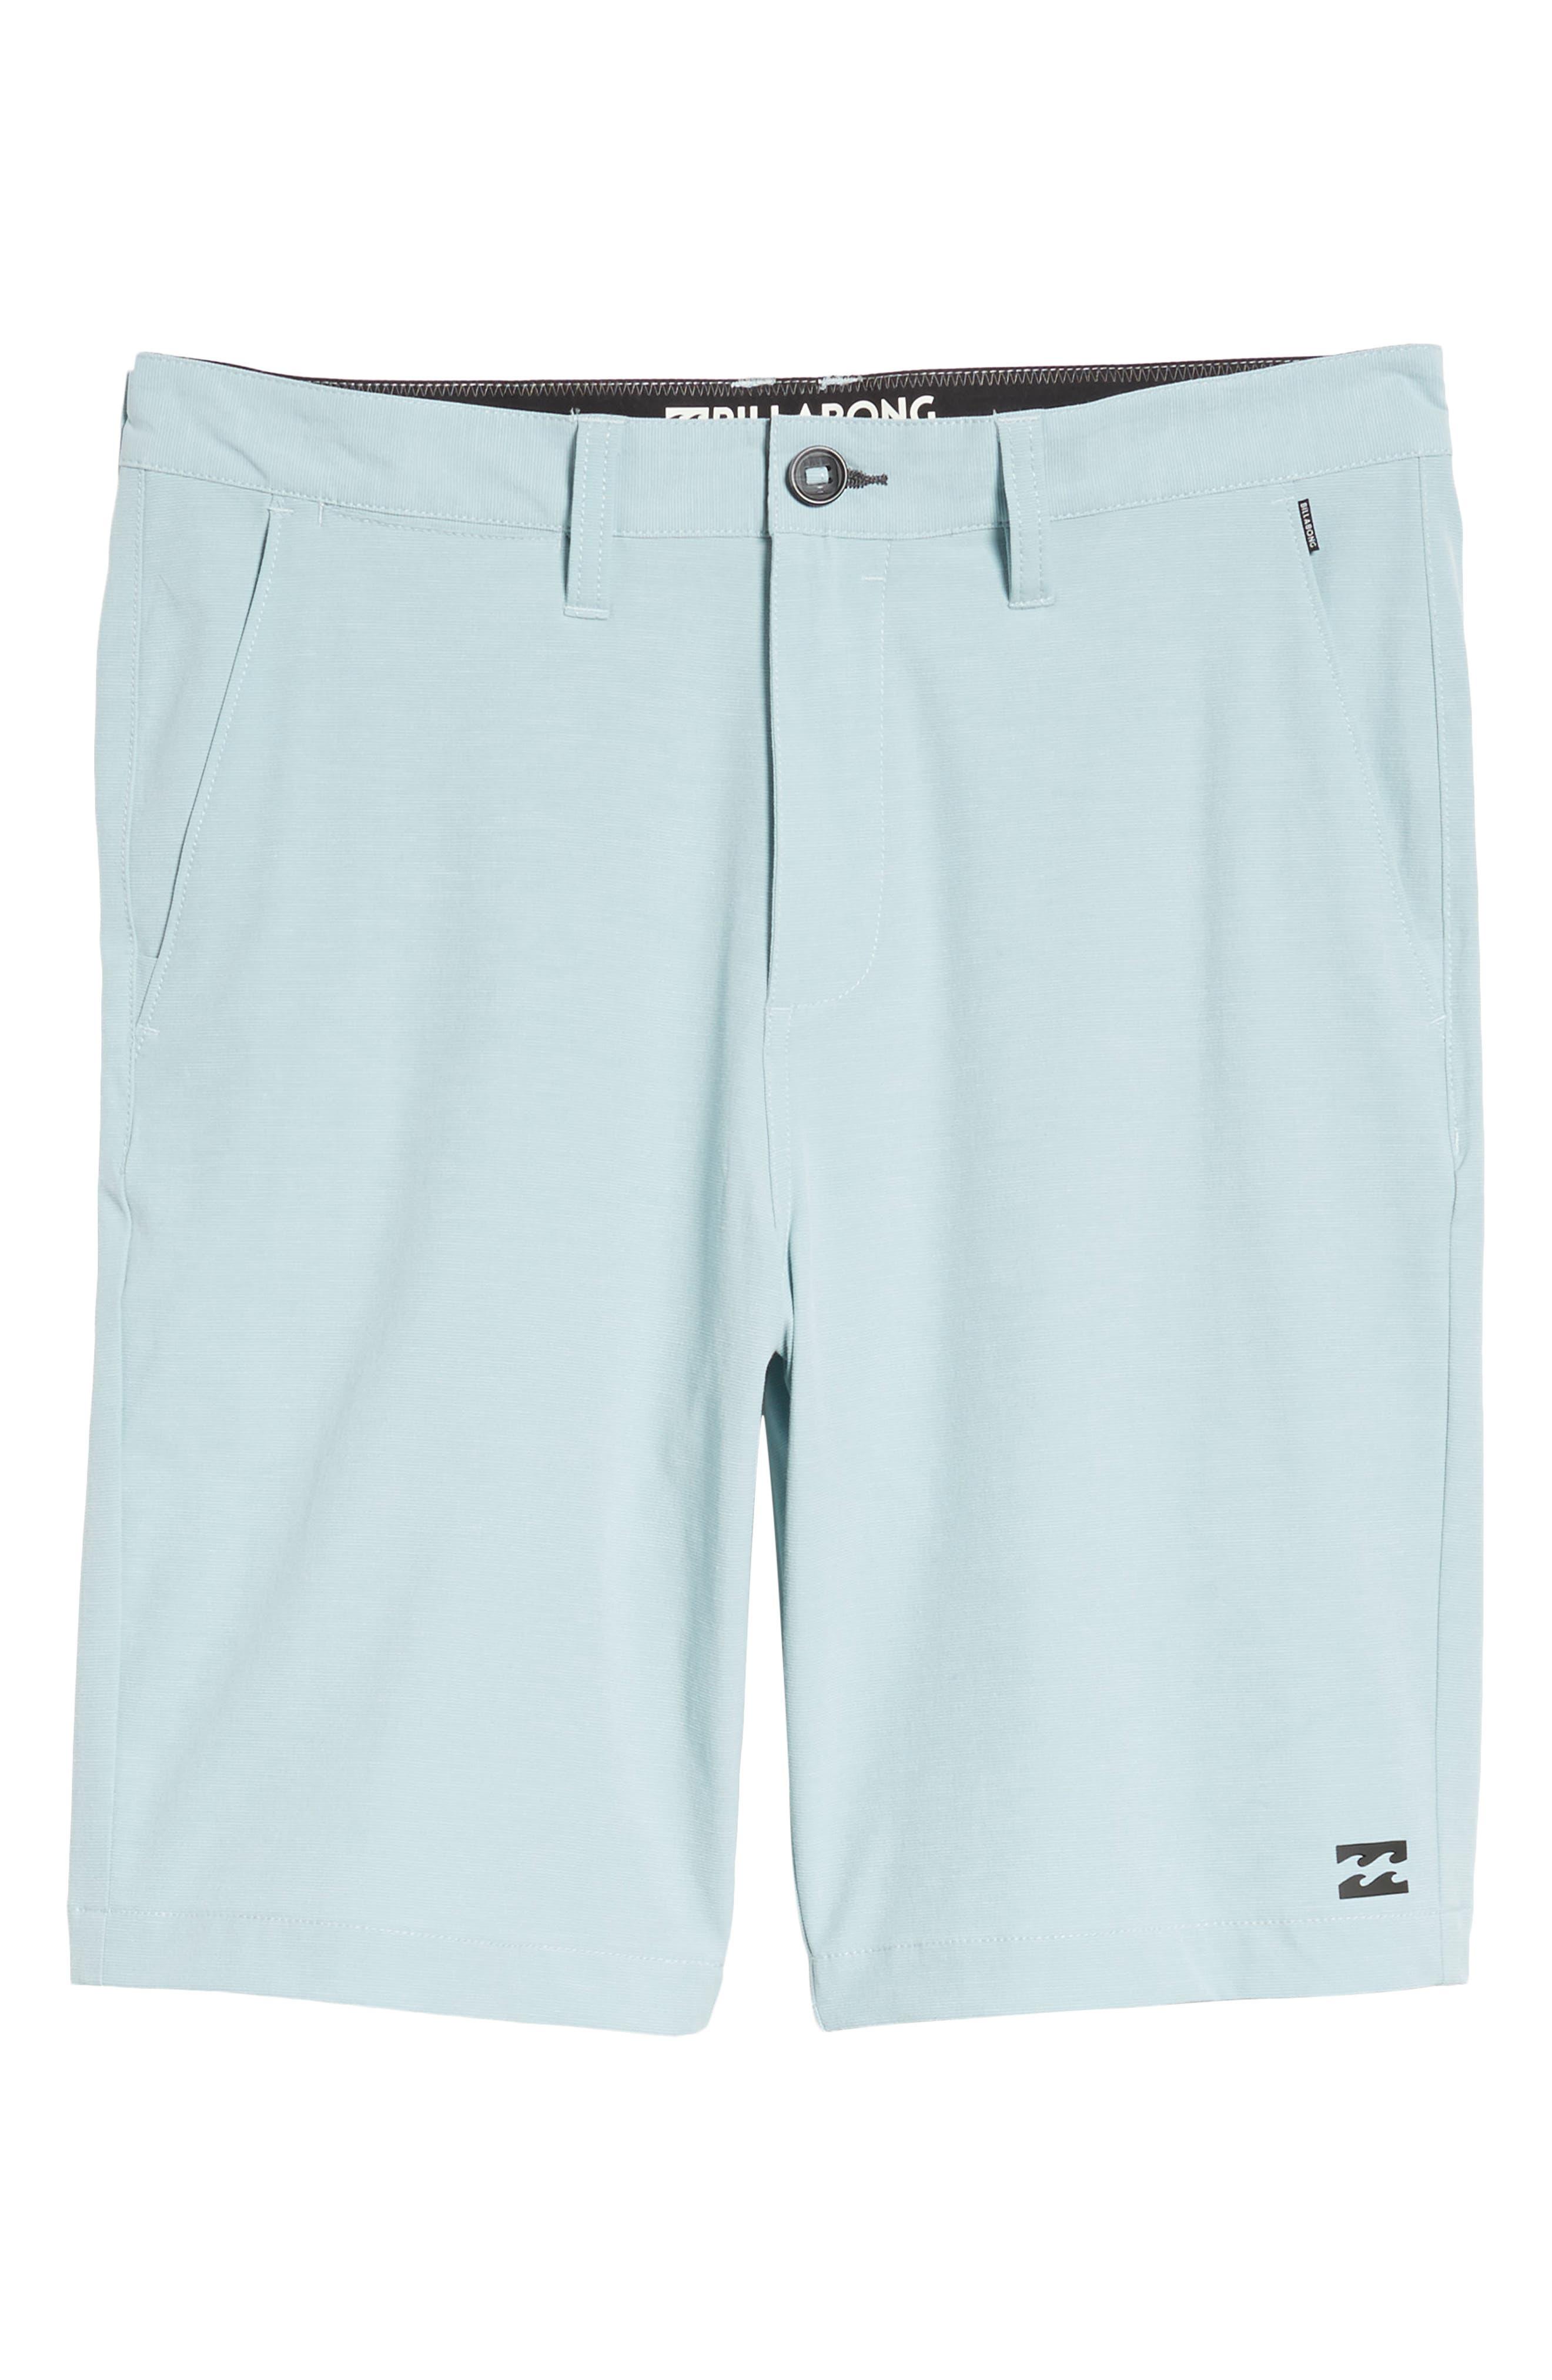 Crossfire X Hybrid Shorts,                             Alternate thumbnail 34, color,